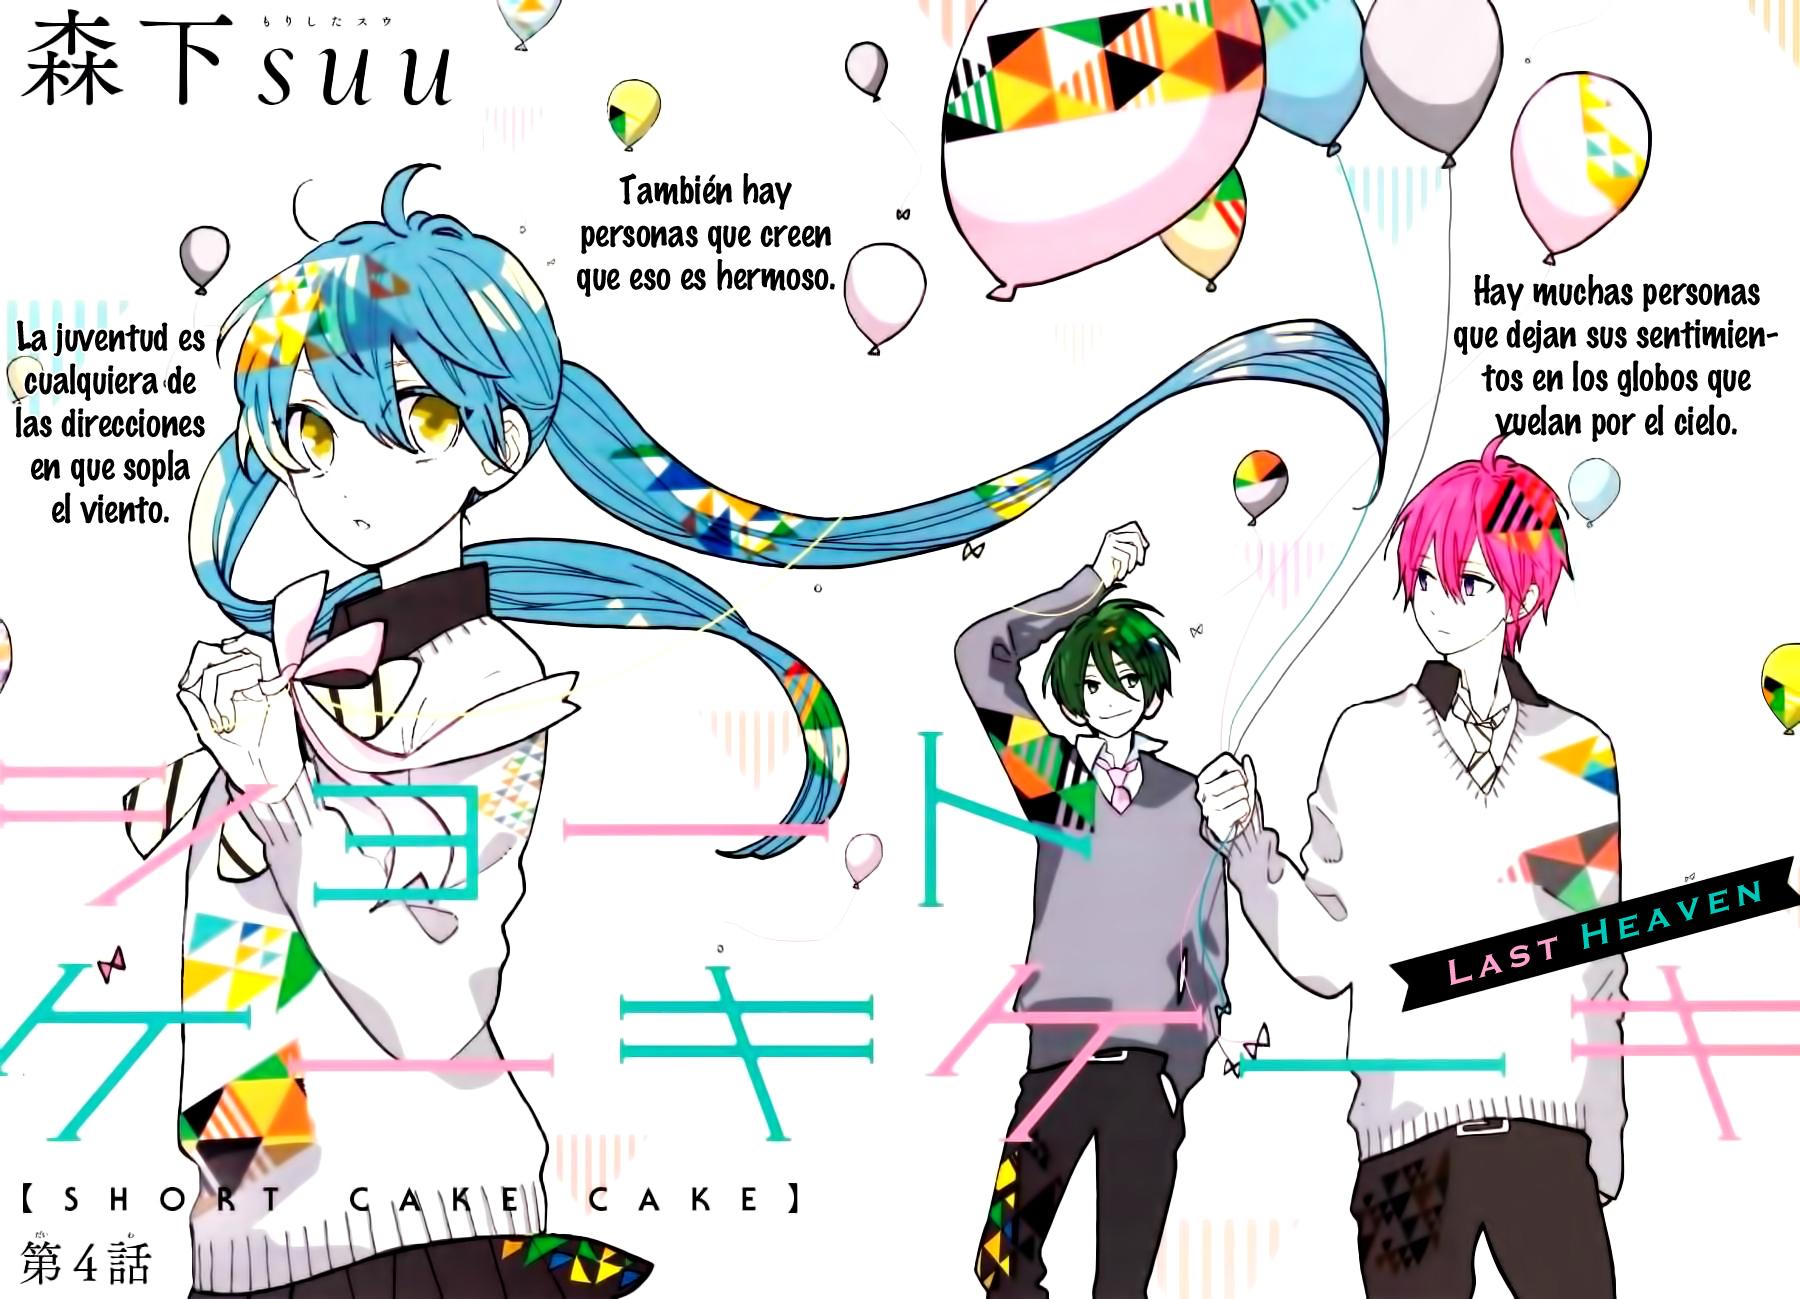 http://c5.ninemanga.com/es_manga/19/18451/442045/57362b724248d953ff60c2d627e7dafa.jpg Page 2